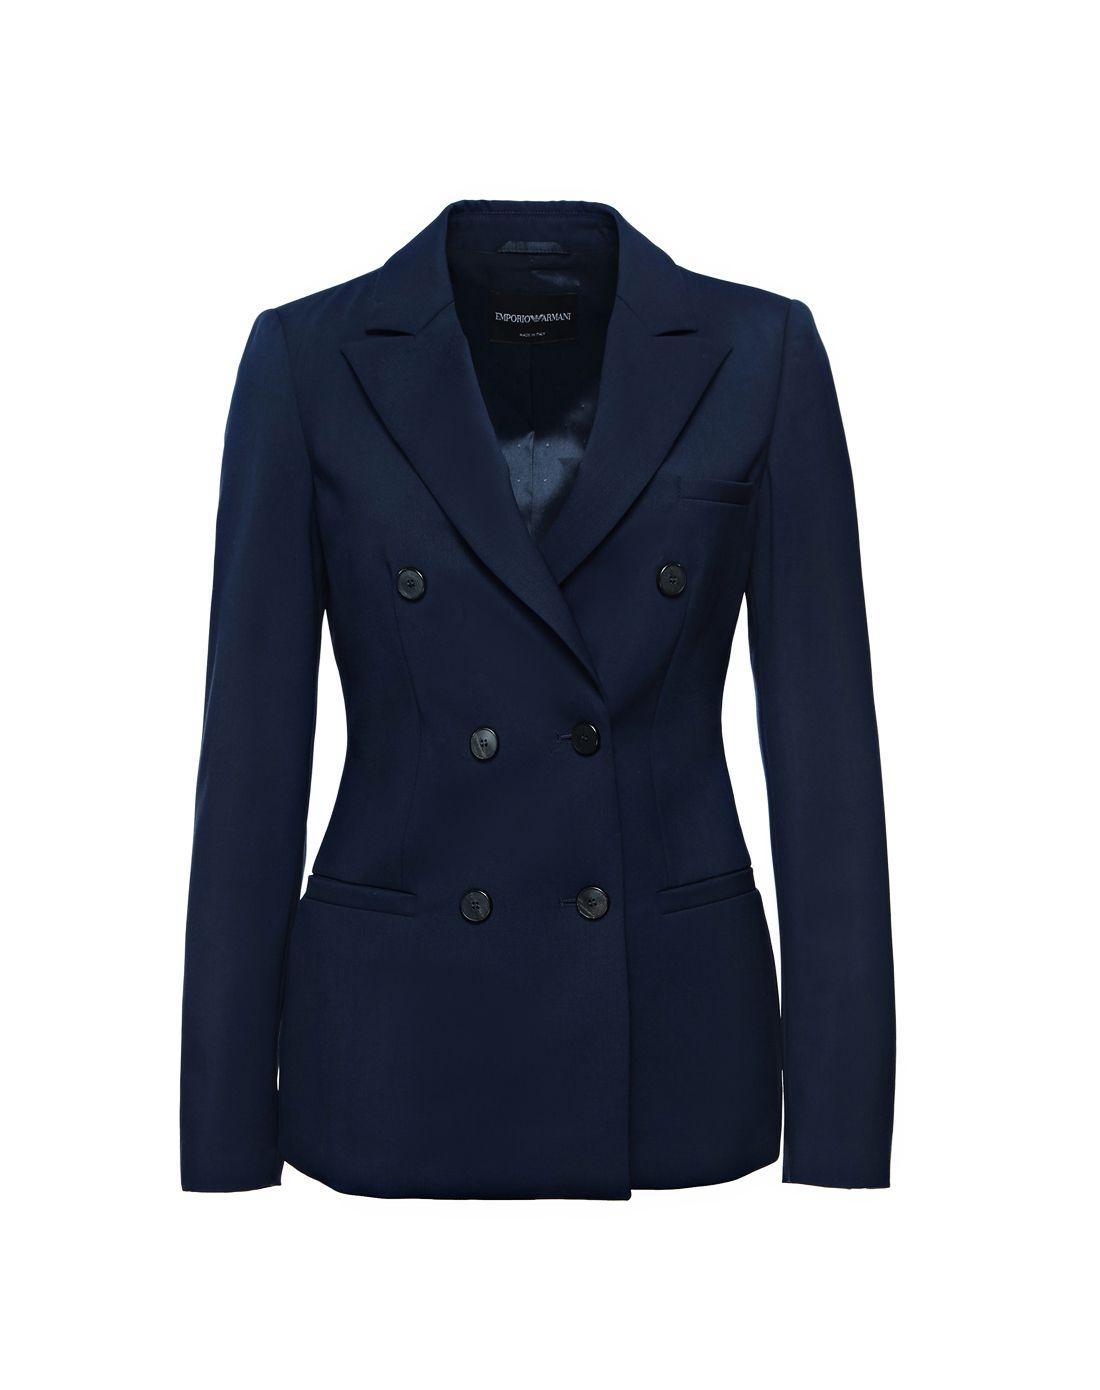 emporio armani女款藏蓝色双排扣西装外套